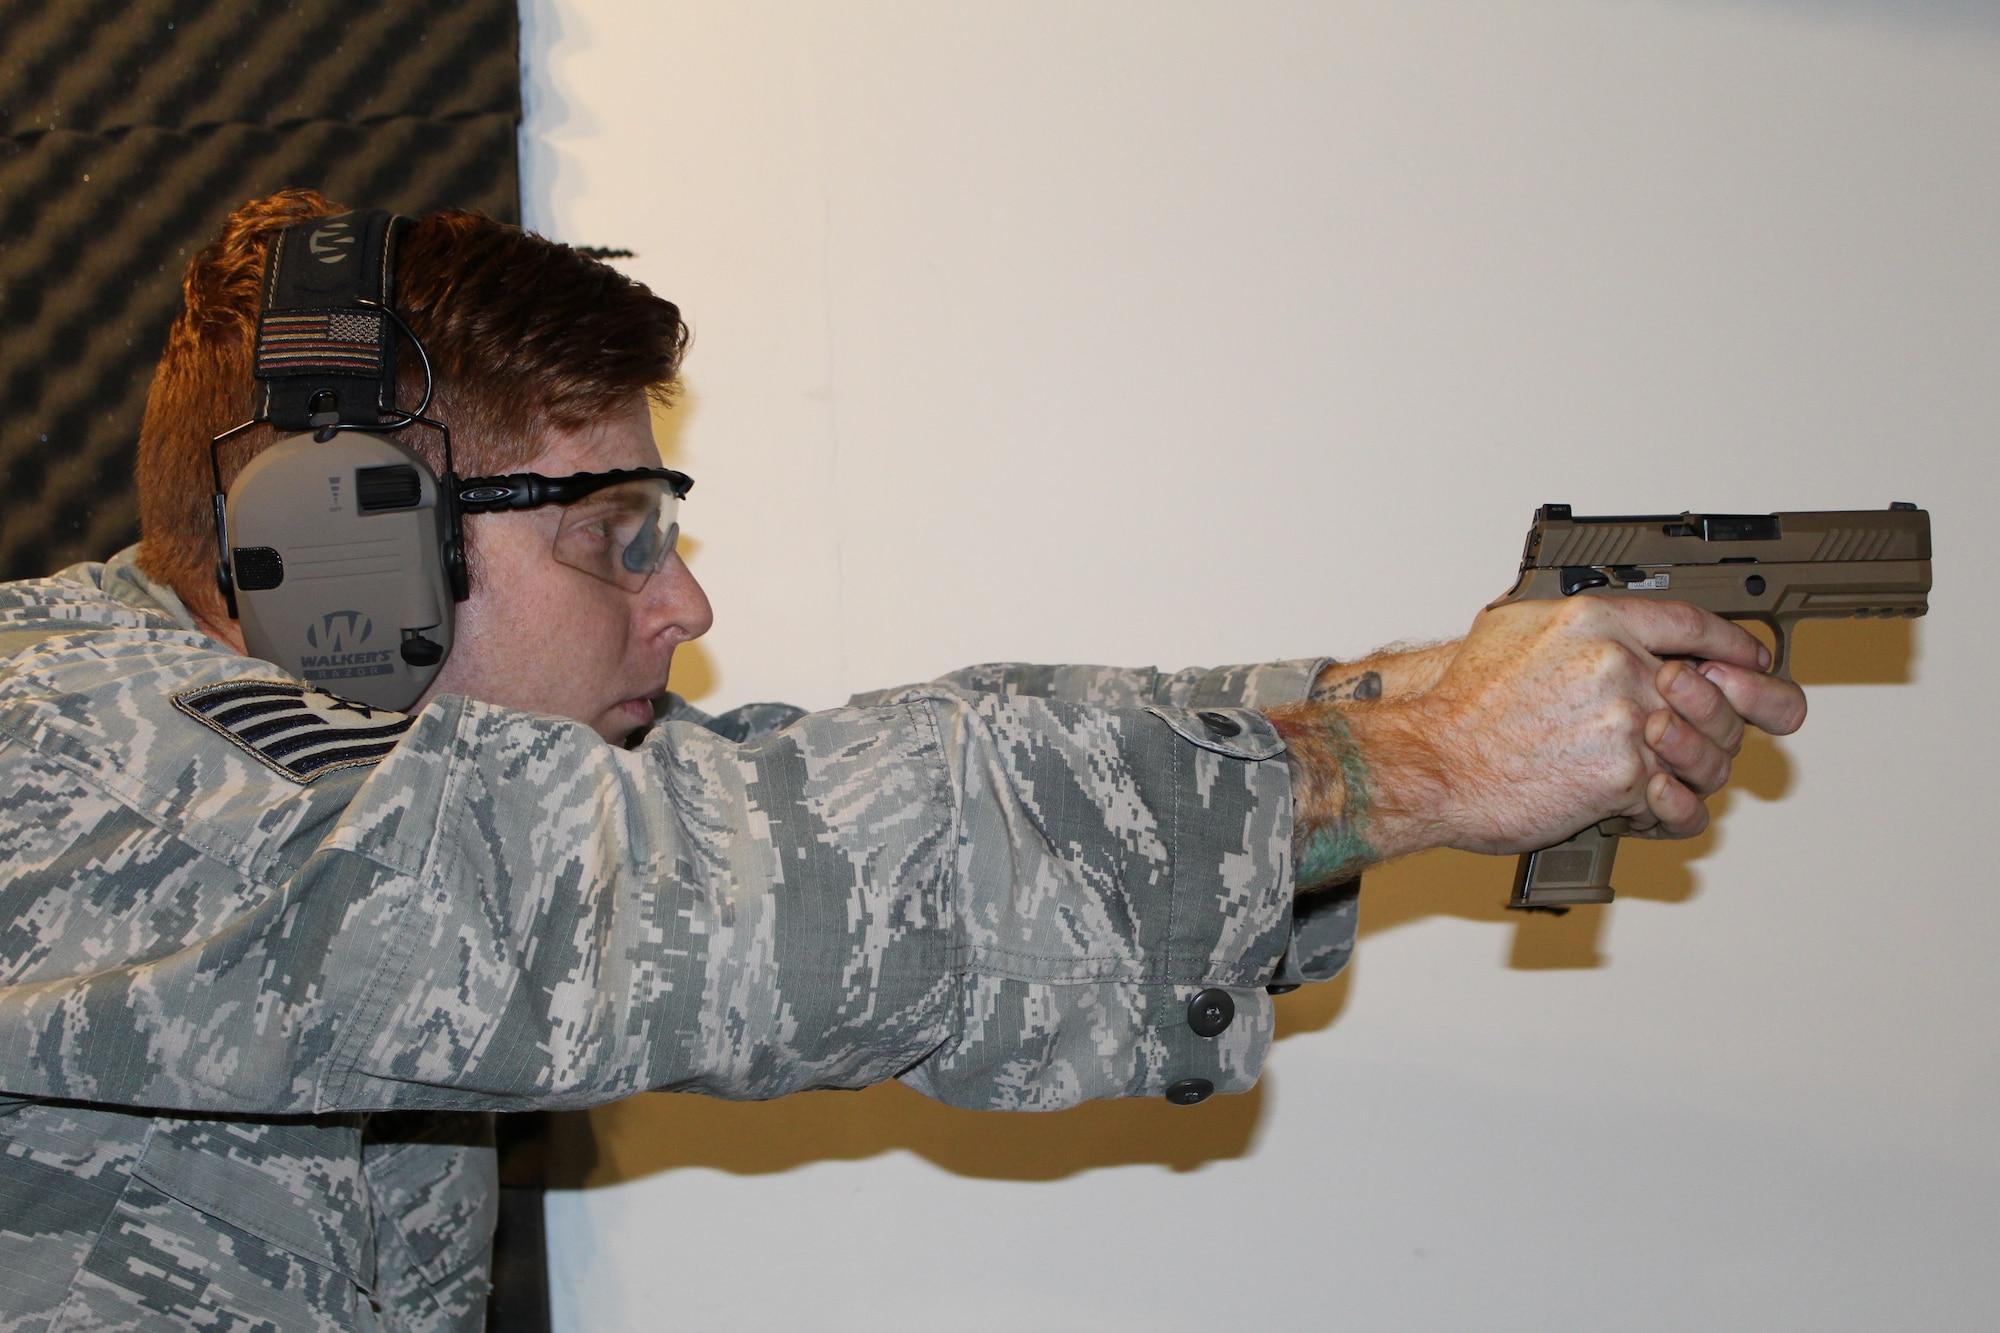 M18 Modular Handgun System